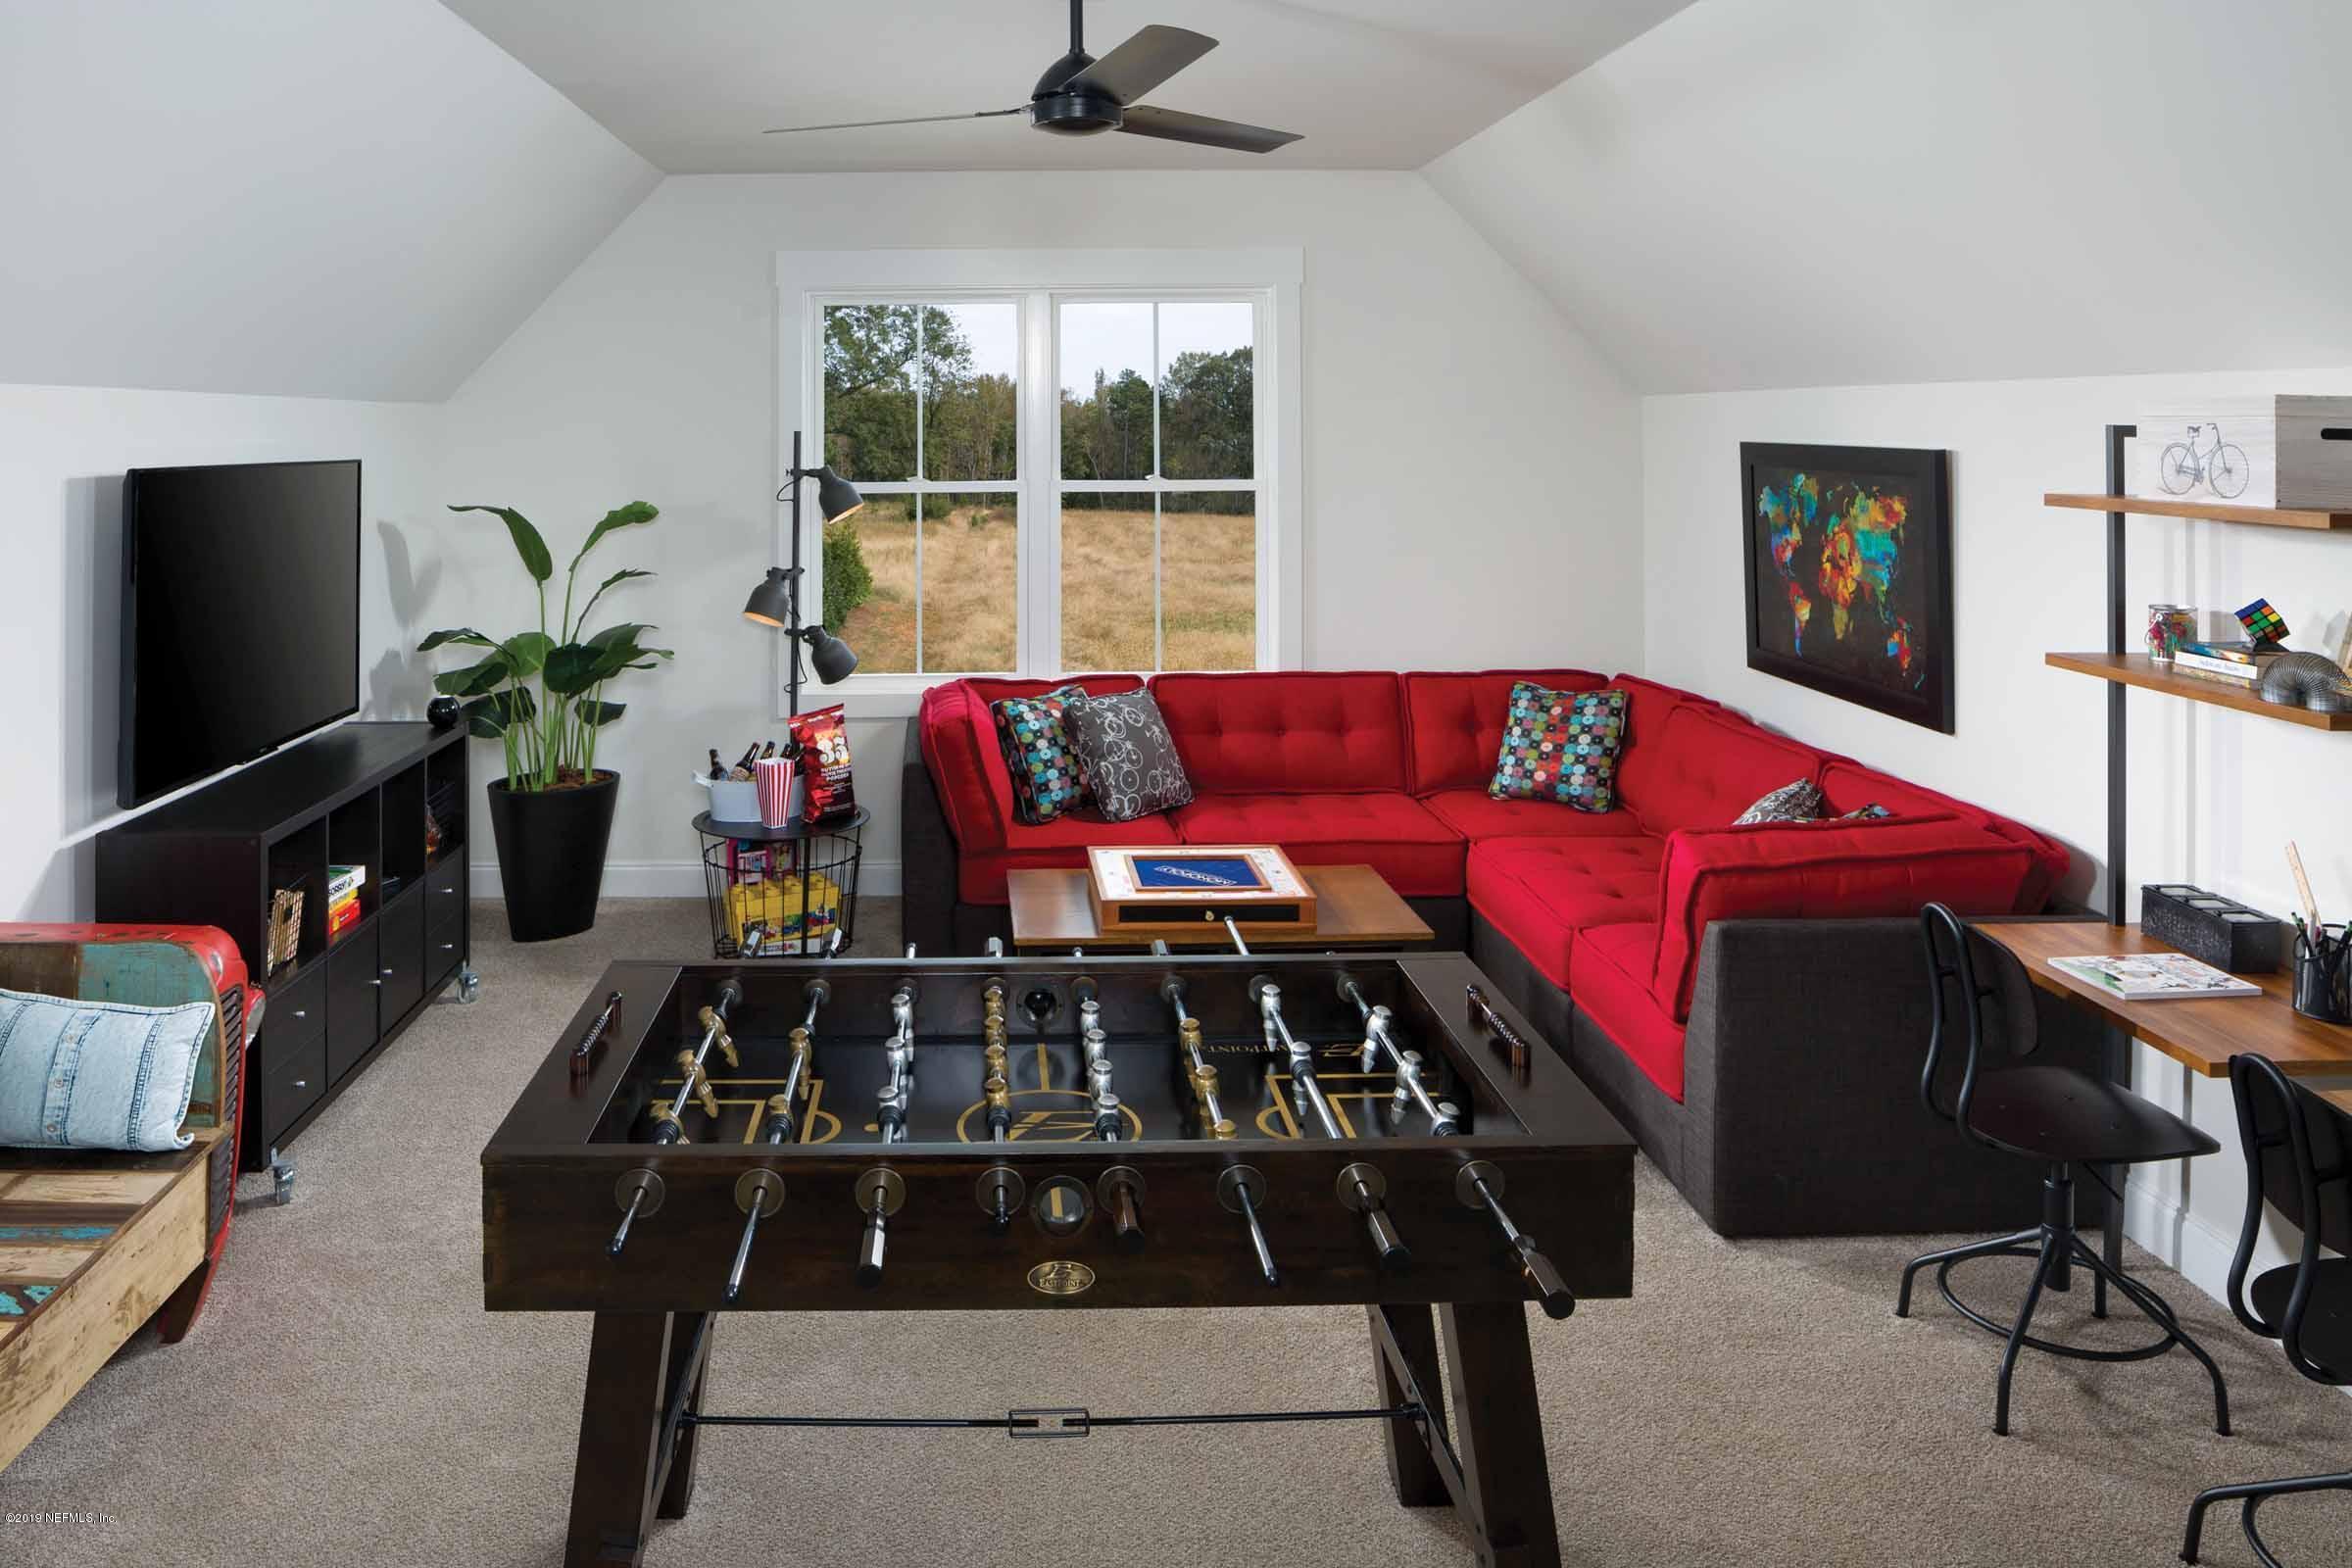 2805 OAK GROVE, ST AUGUSTINE, FLORIDA 32092, 4 Bedrooms Bedrooms, ,4 BathroomsBathrooms,Residential - single family,For sale,OAK GROVE,979793